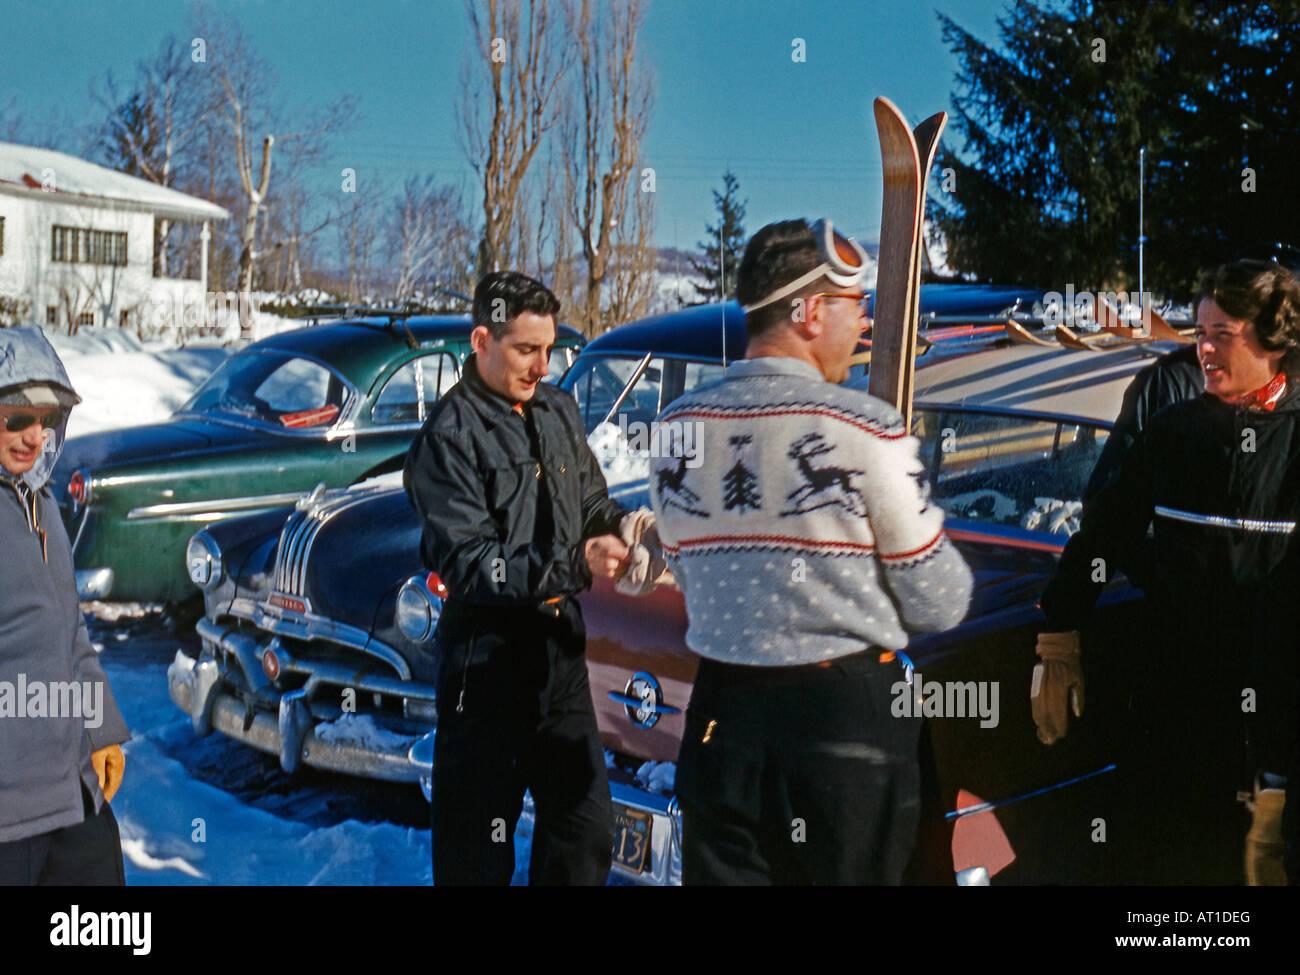 Skifahren der 1950er Jahre Stil, graue Felsen, Mount Tremblant, Quebec, Kanada, 1955 Stockbild